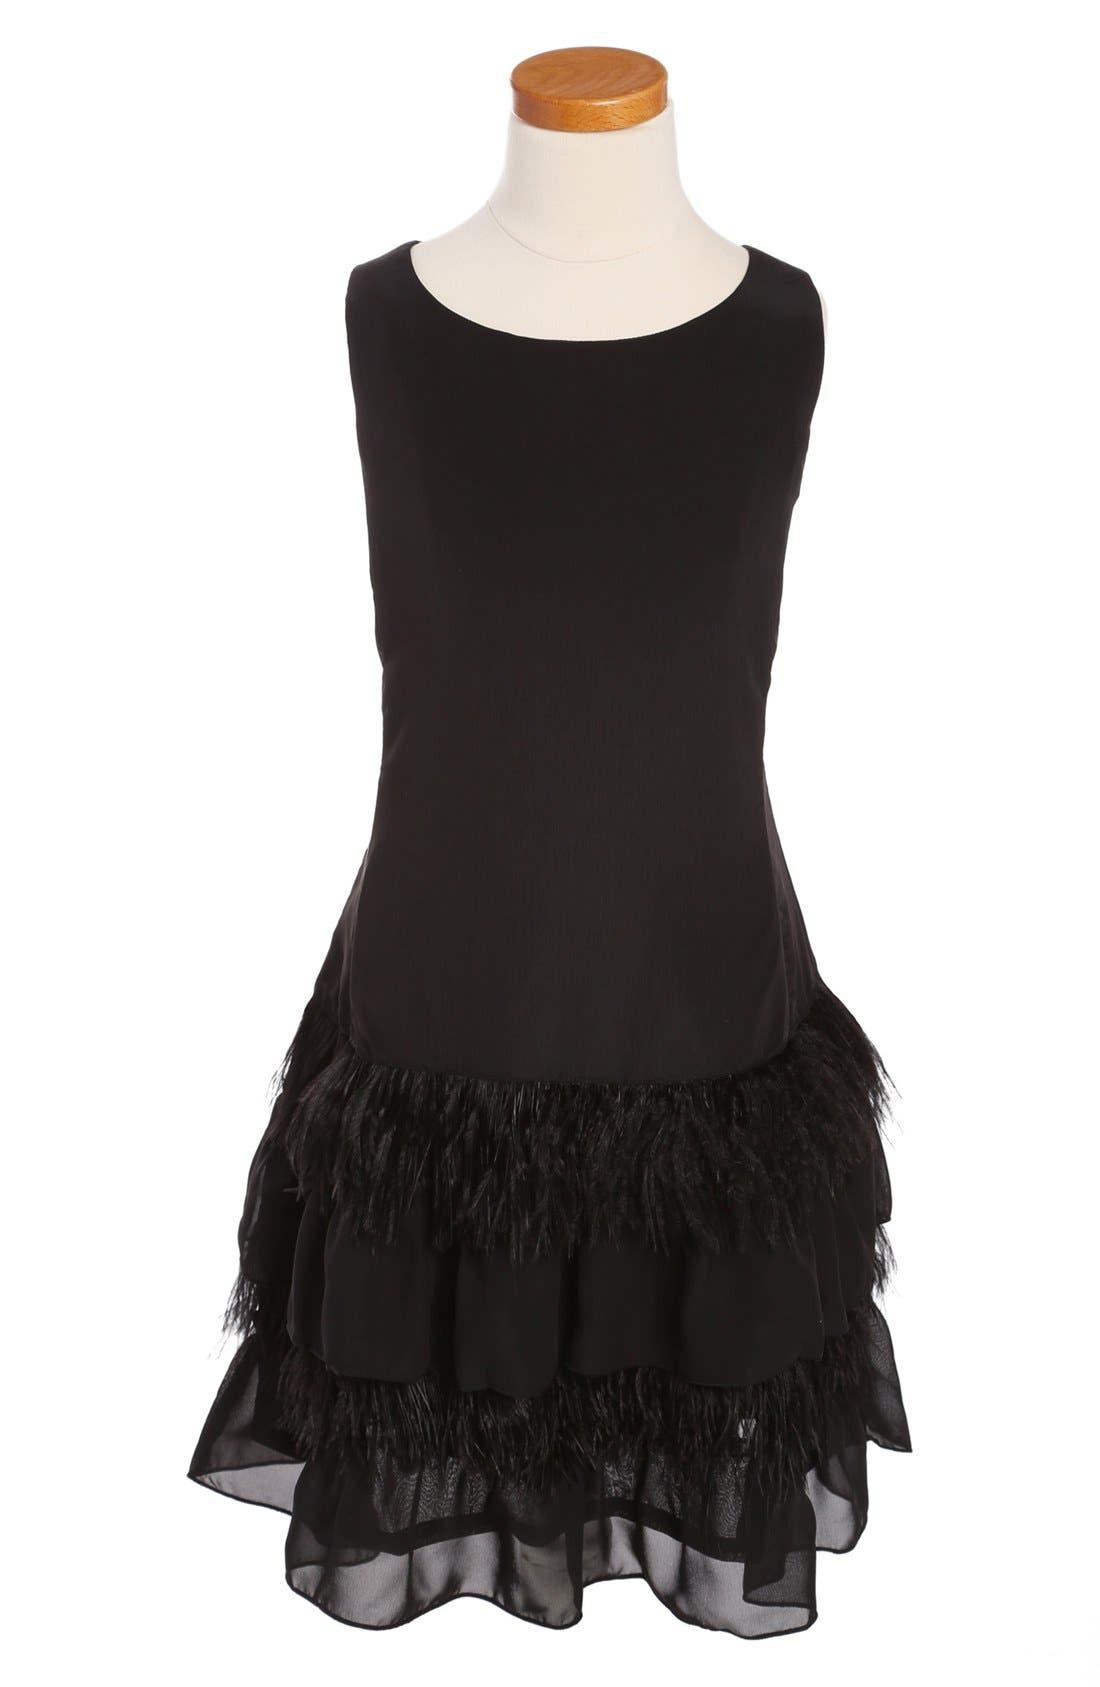 Main Image - Ruby & Bloom 'Hazel' Dress (Big Girls)